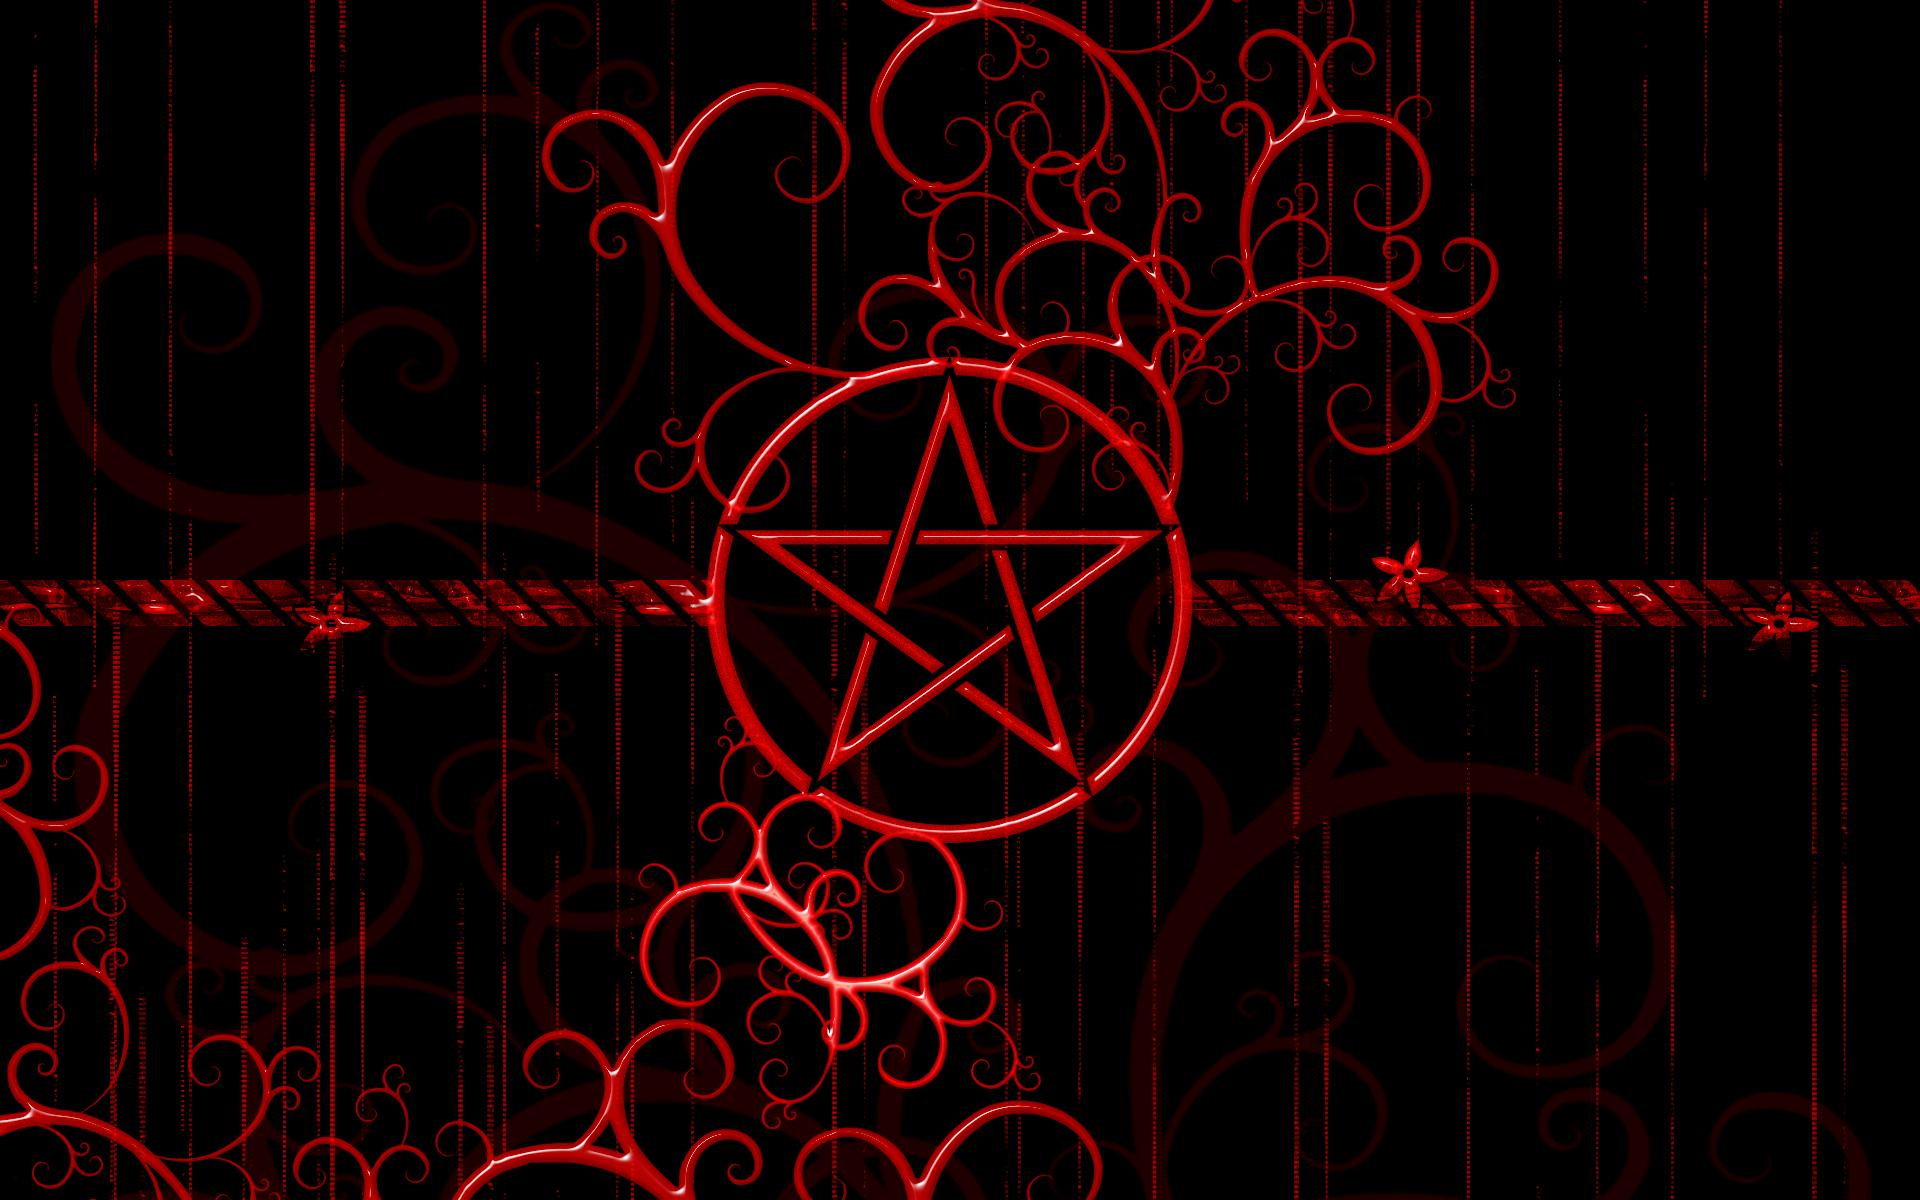 Dark horror evil symbol satan penta star wallpaper 1920x1200 29733 1920x1200